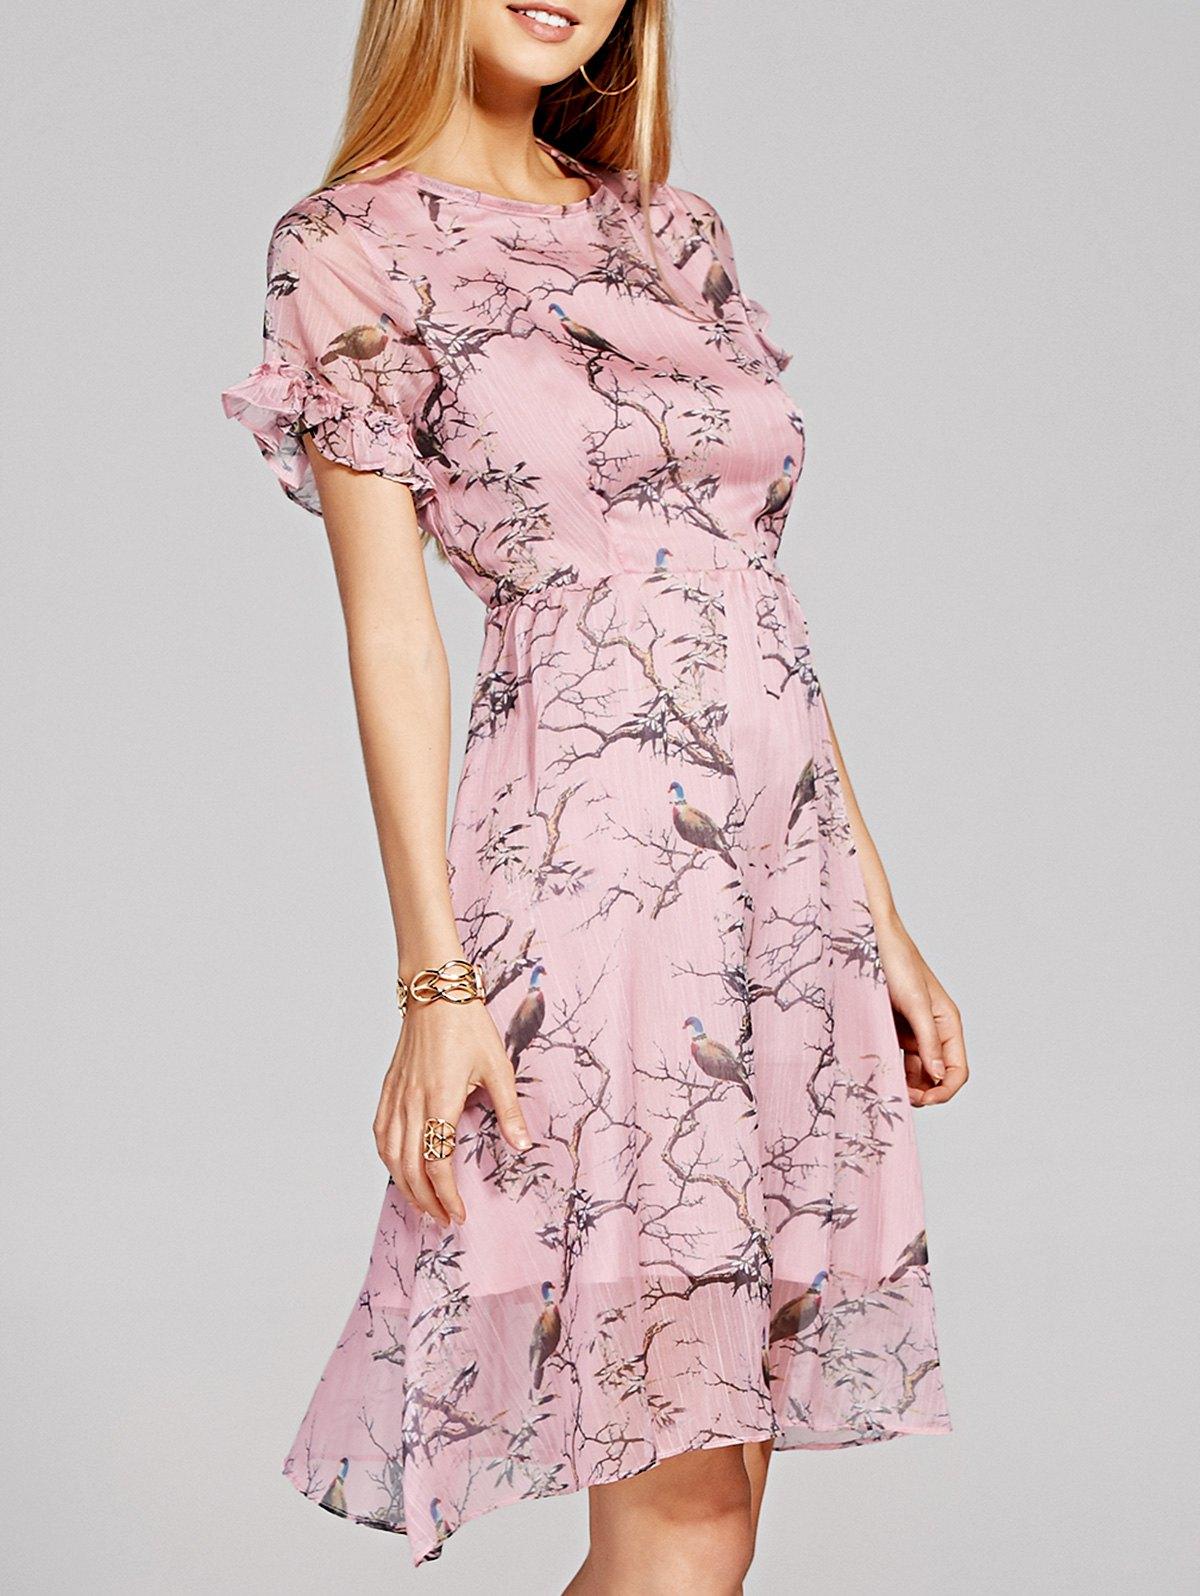 Stylish Pull Ruffle Sleeve Bird Print Skater Dress For Women